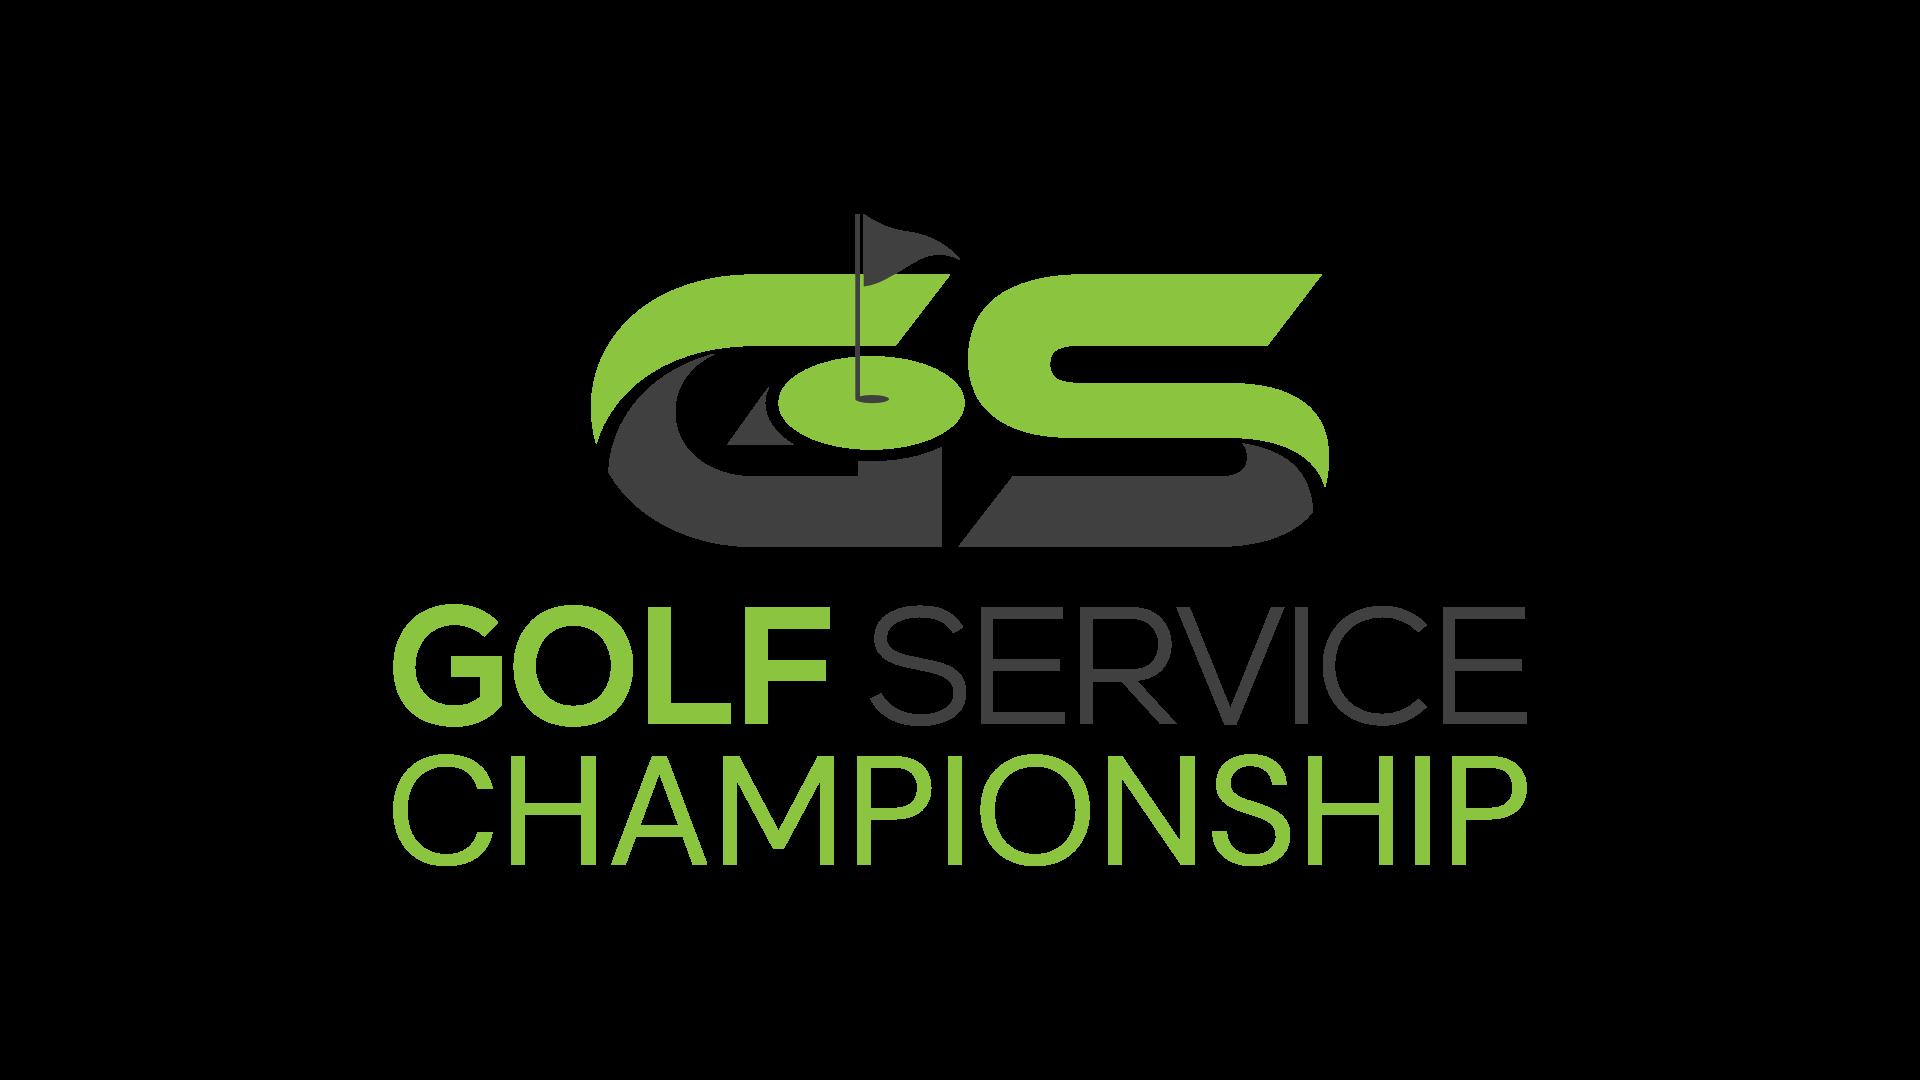 Golf Service Championship